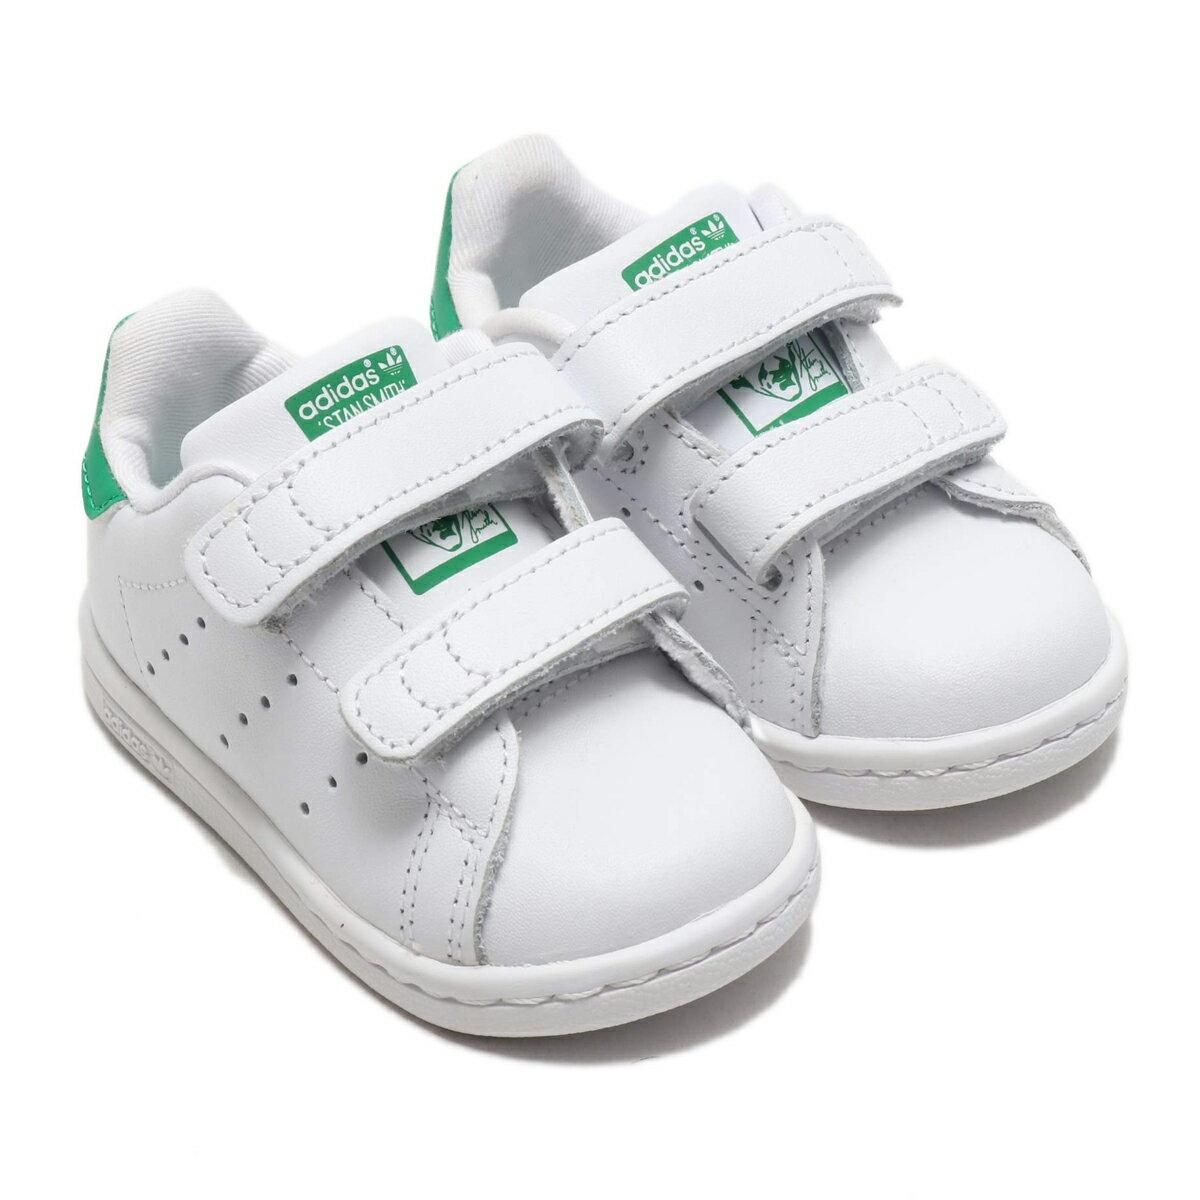 adidas Originals STAN SMITH CF I (Running White/Running White/Green) 【キッズサイズ】【18SS-I】